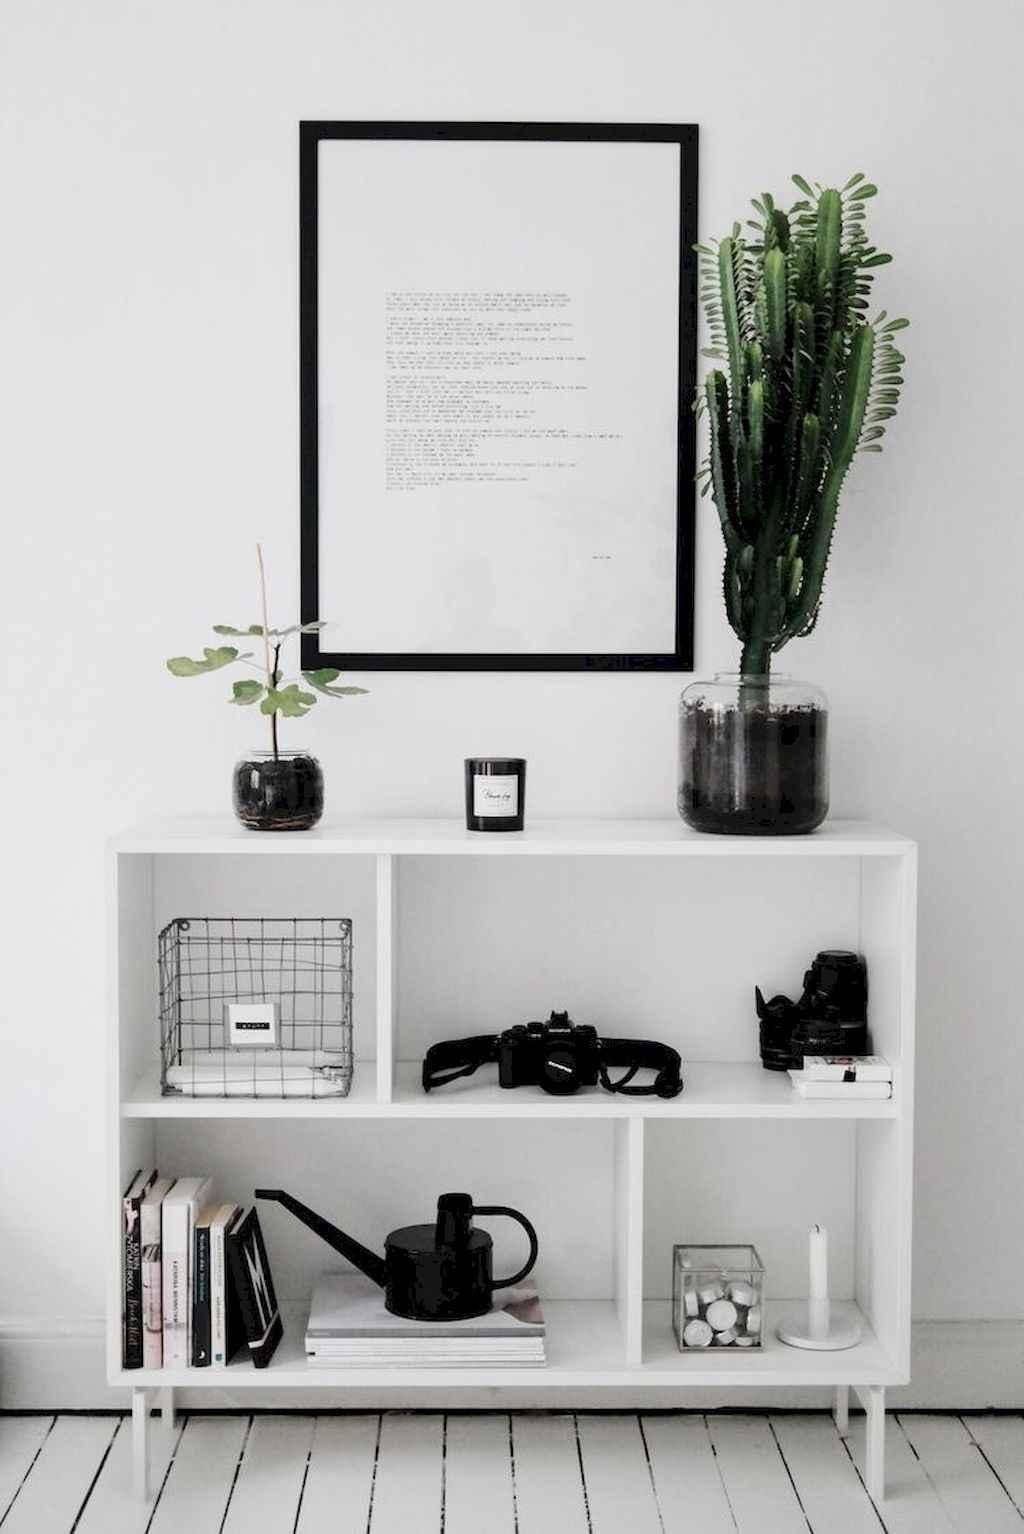 Simple minimalist apartment decor ideas 35 homespecially - Home decor sarasota minimalist ...